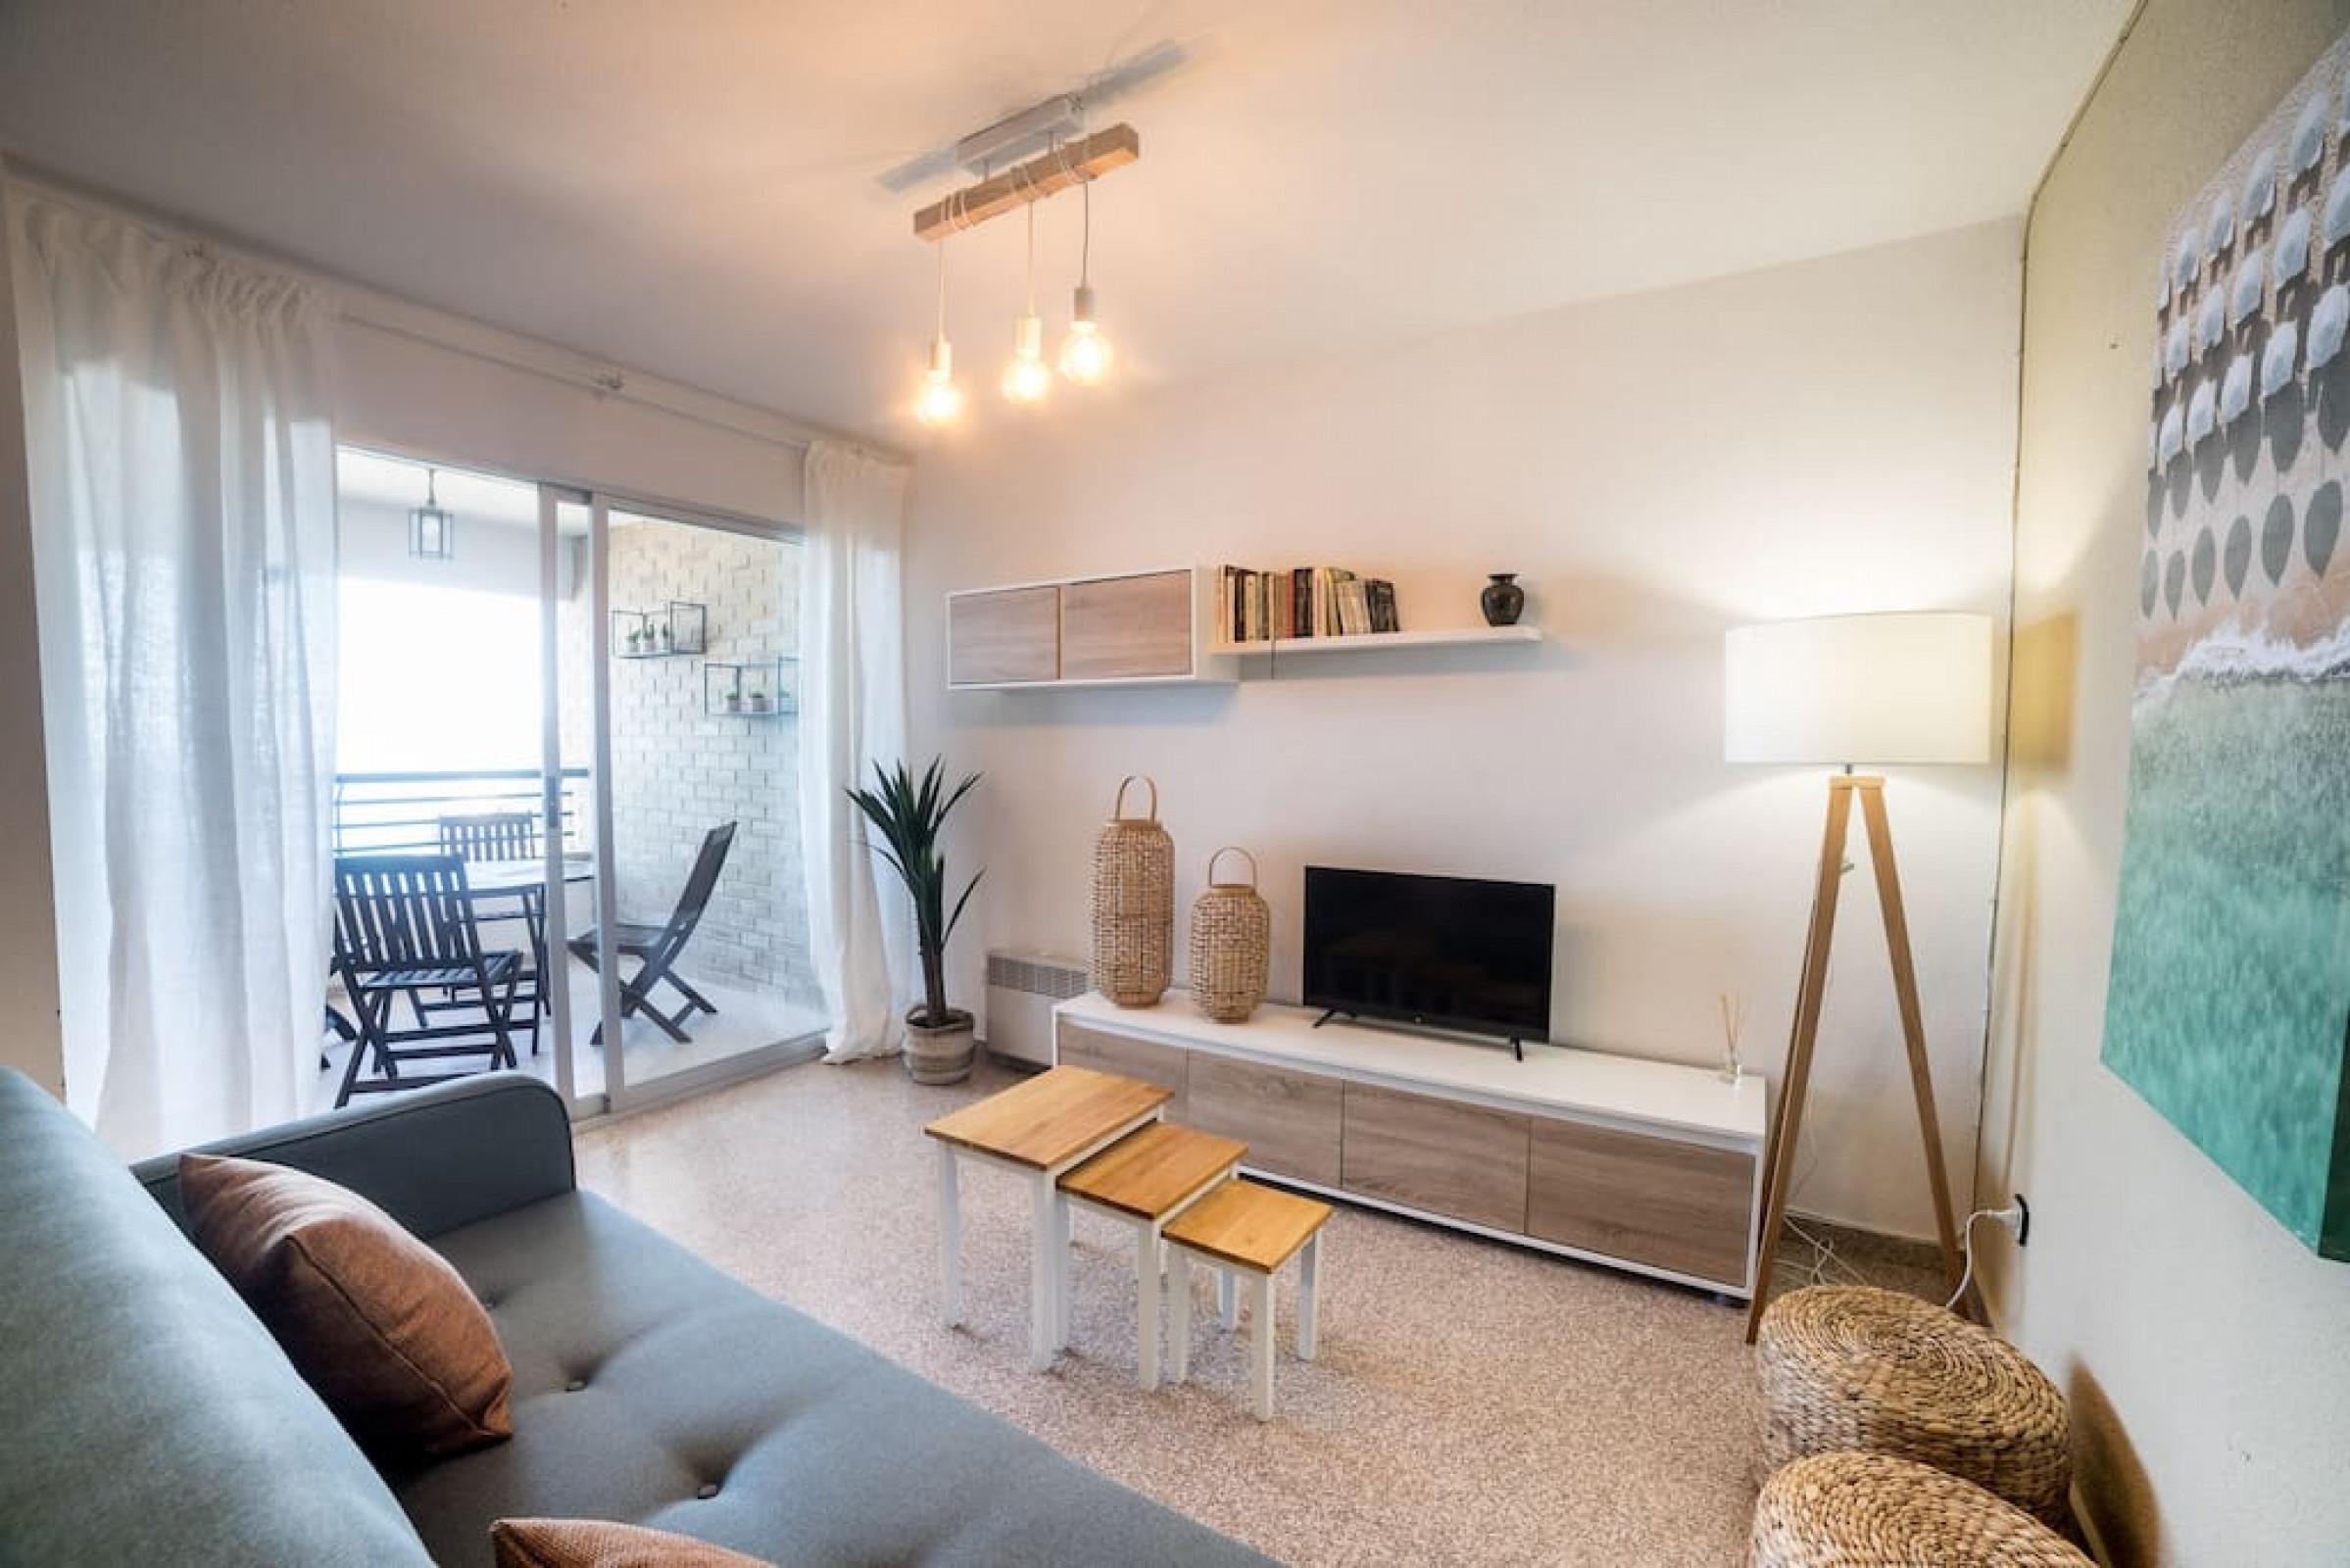 Moonkey - Apartamento Coblanca 16